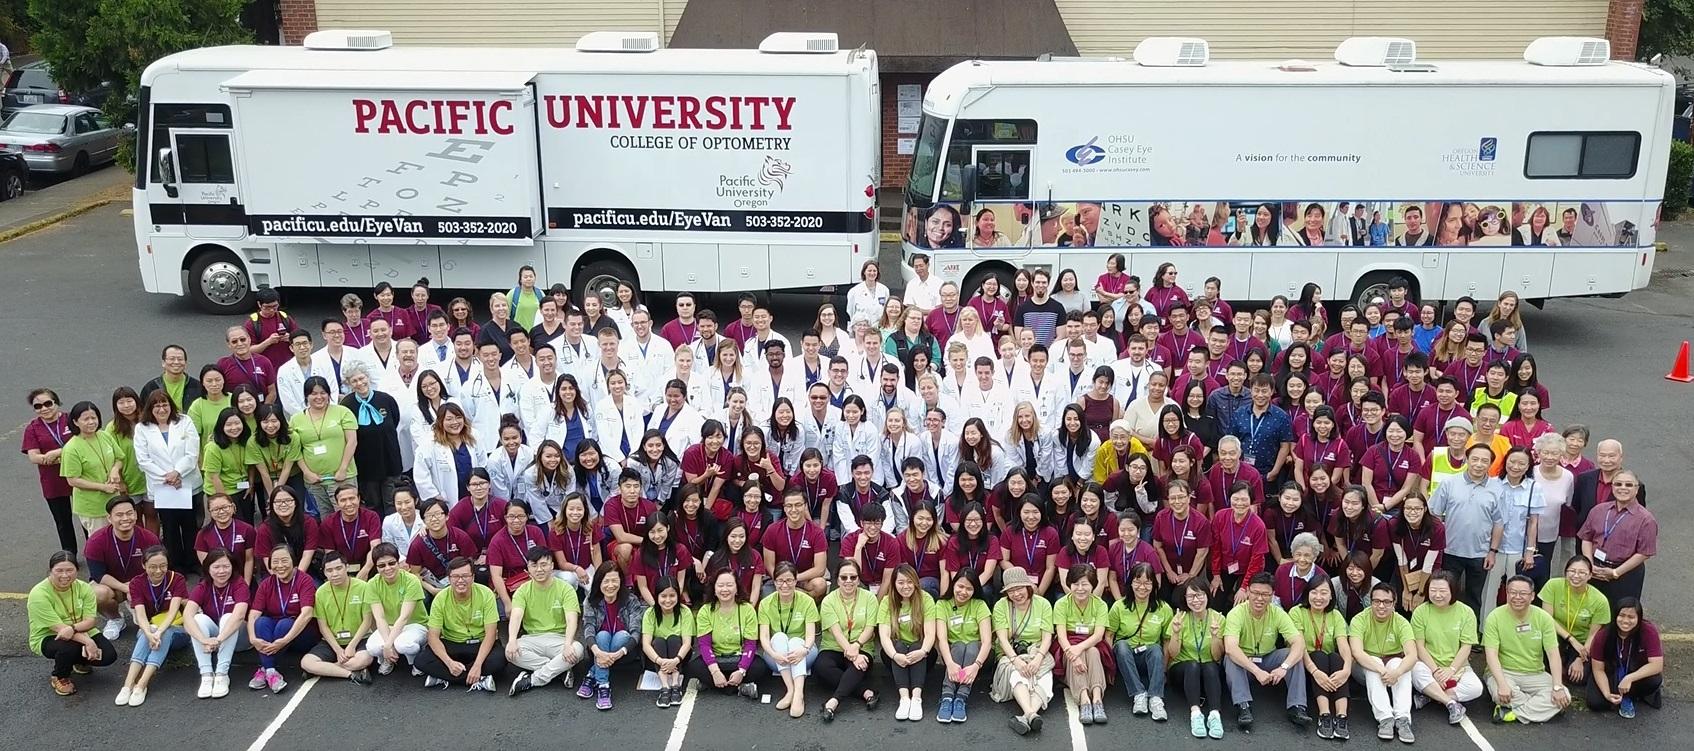 AHSC Staff, Volunteers & Providers At The 16th Annual AHSC Asian Community Health Fair In 2017.